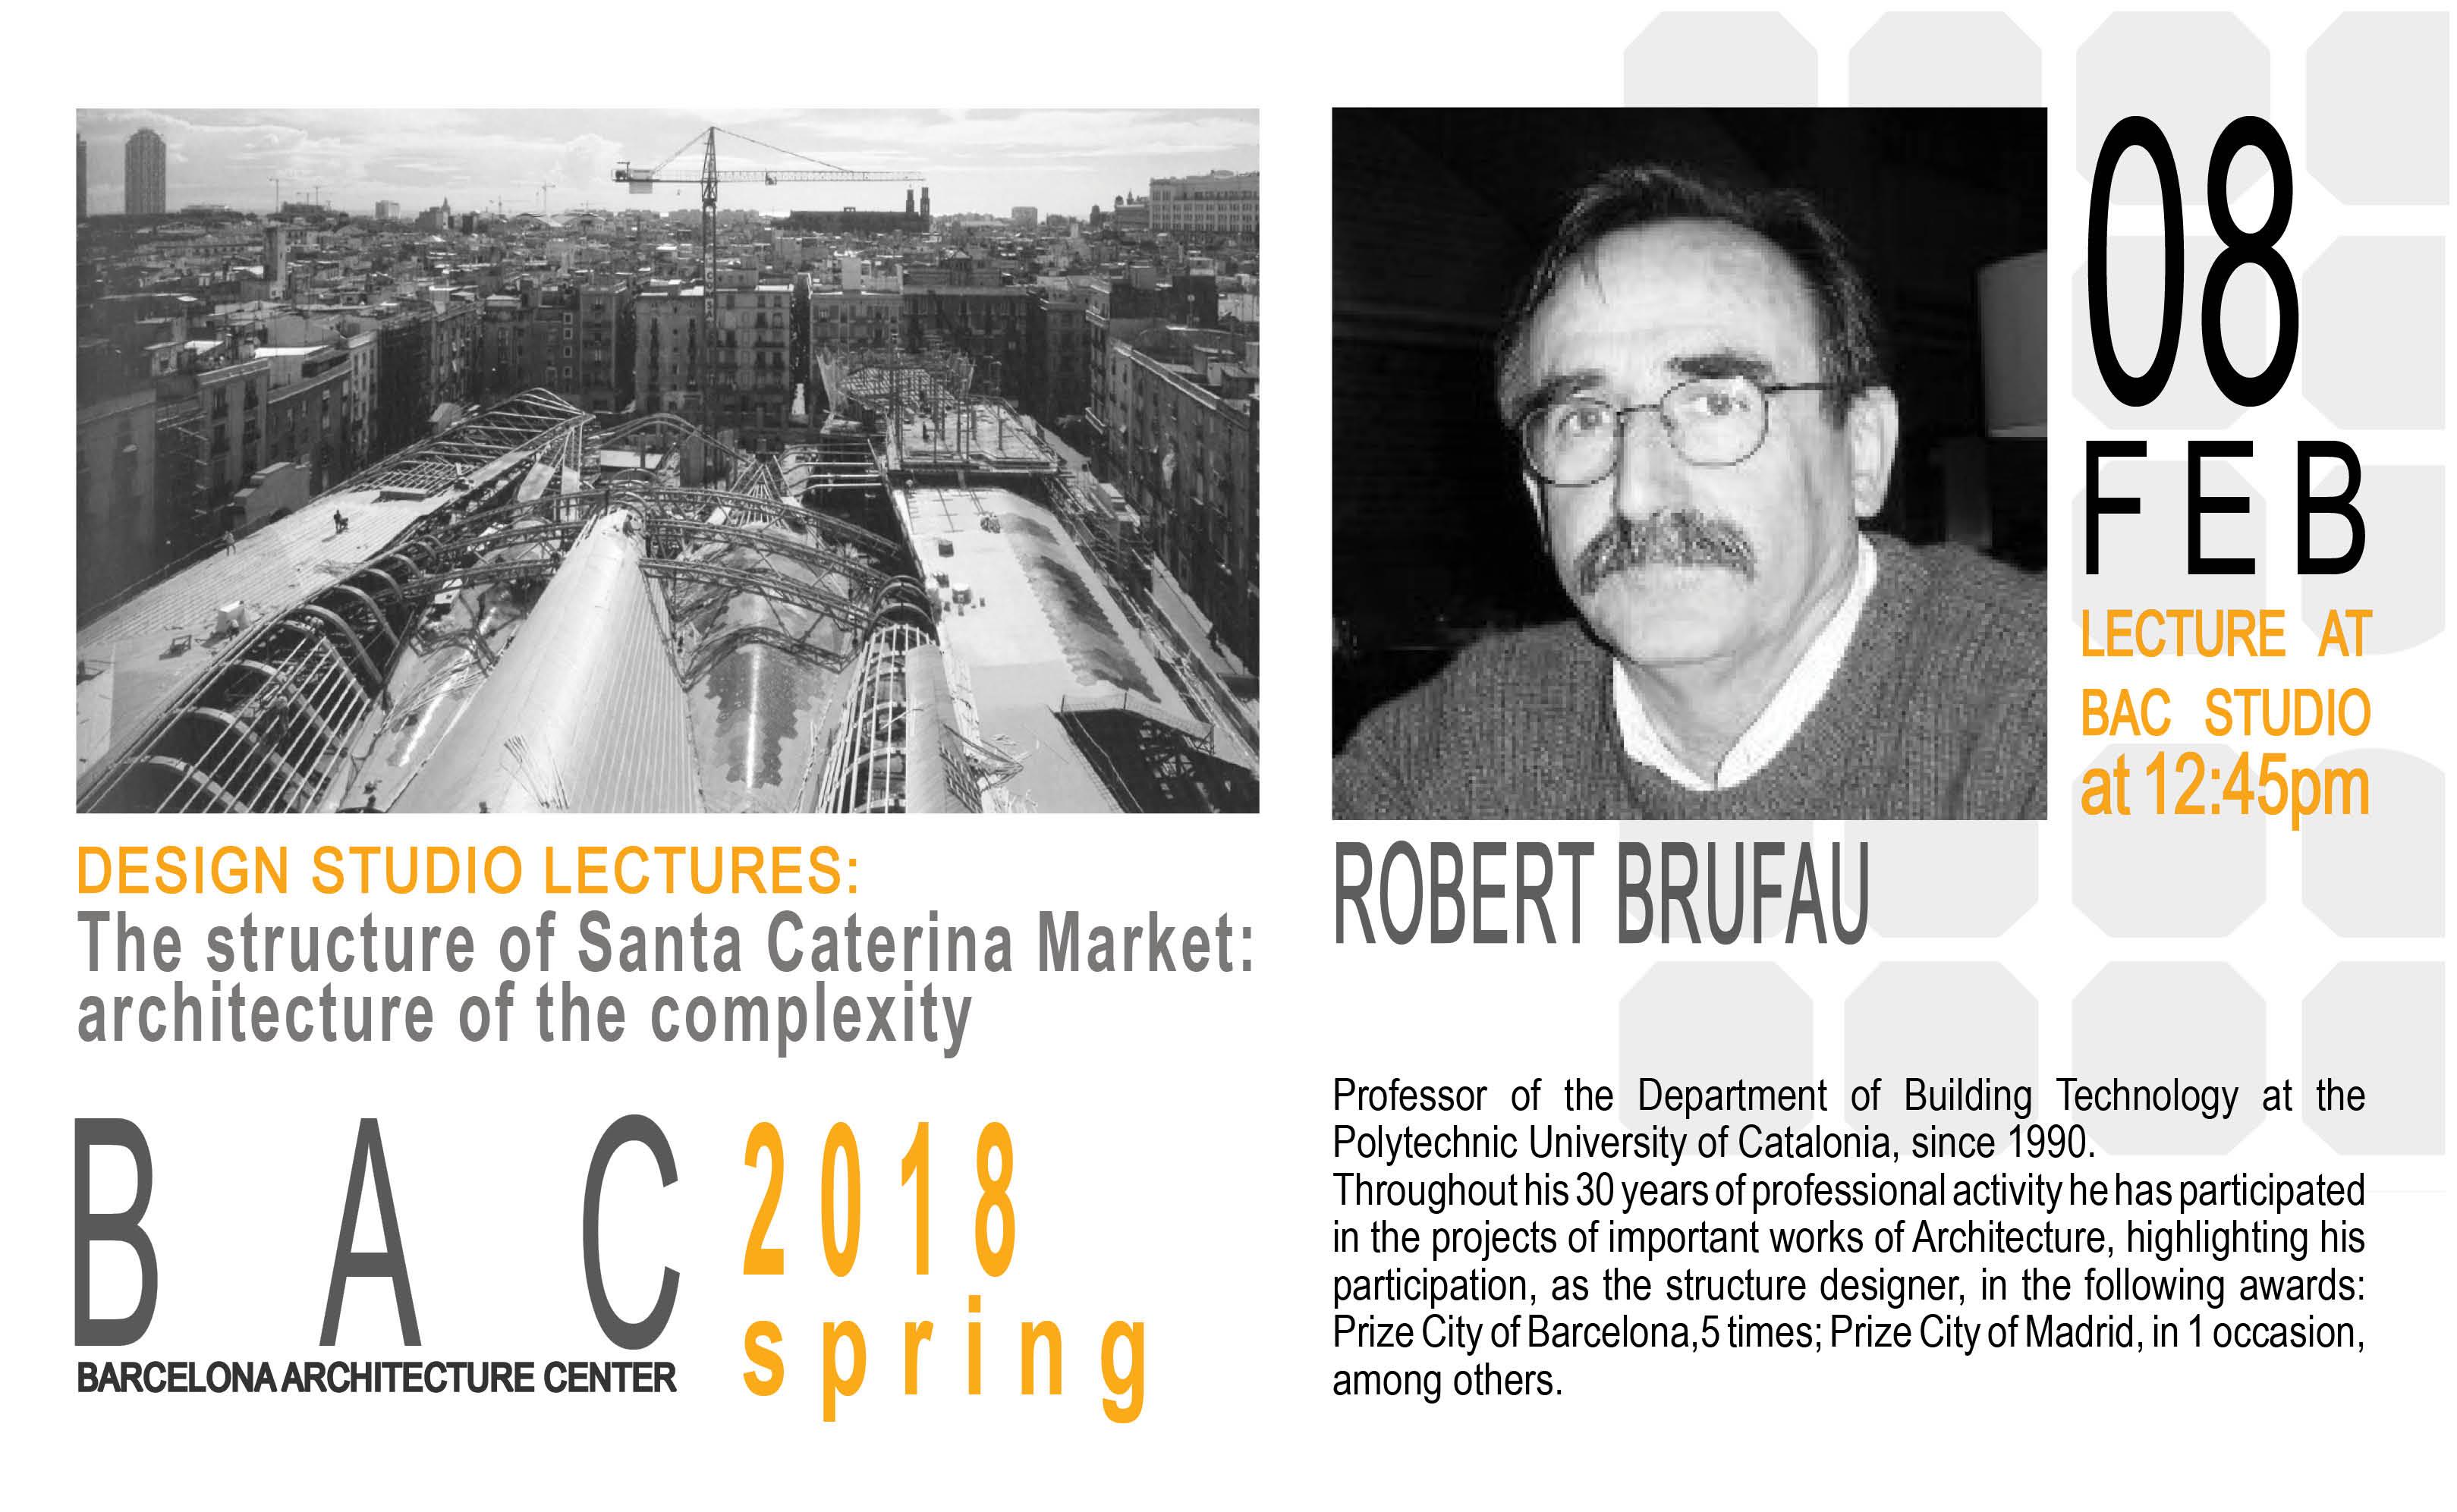 Robert Brufau s18 lecture series_coac.jpg